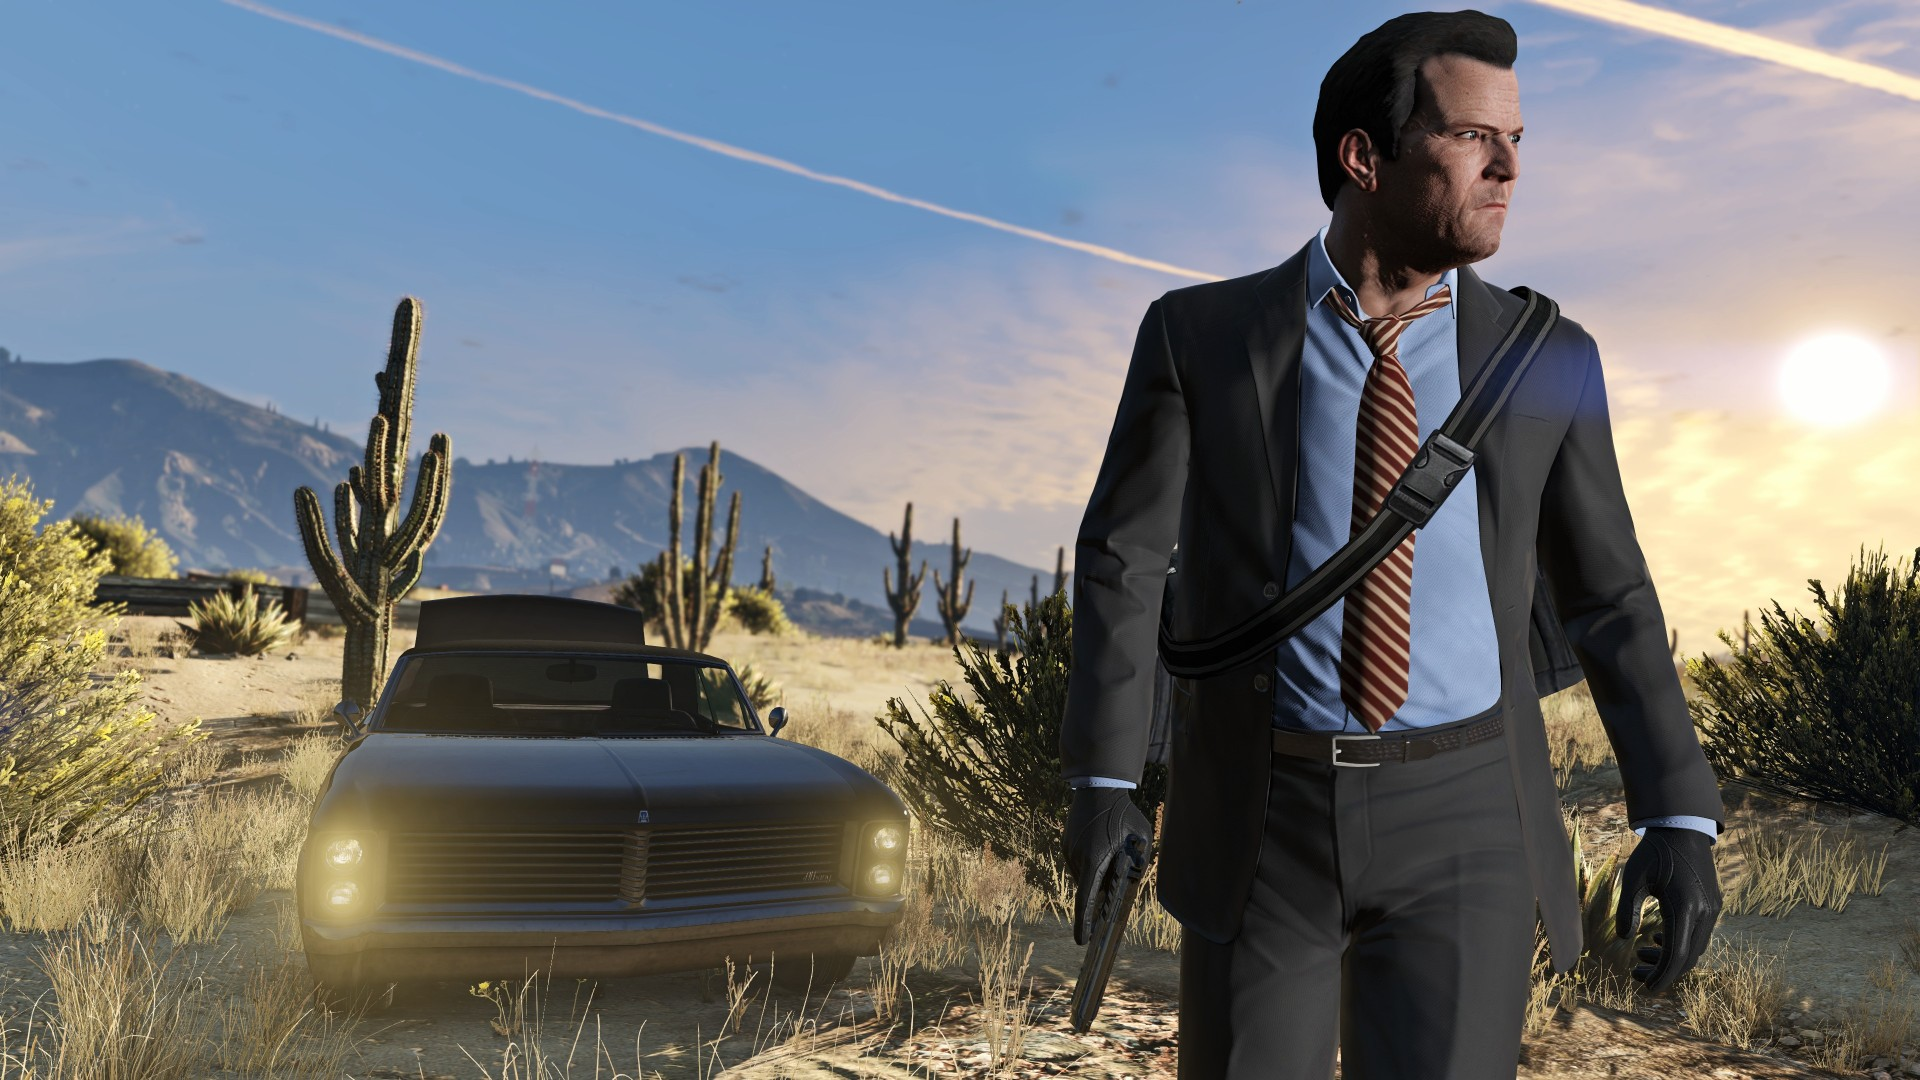 Grand Theft Auto 5 จะลงให้กับ PS5 และ Xbox Series X/S ในวันที่ 11 พฤศจิกายน 2021